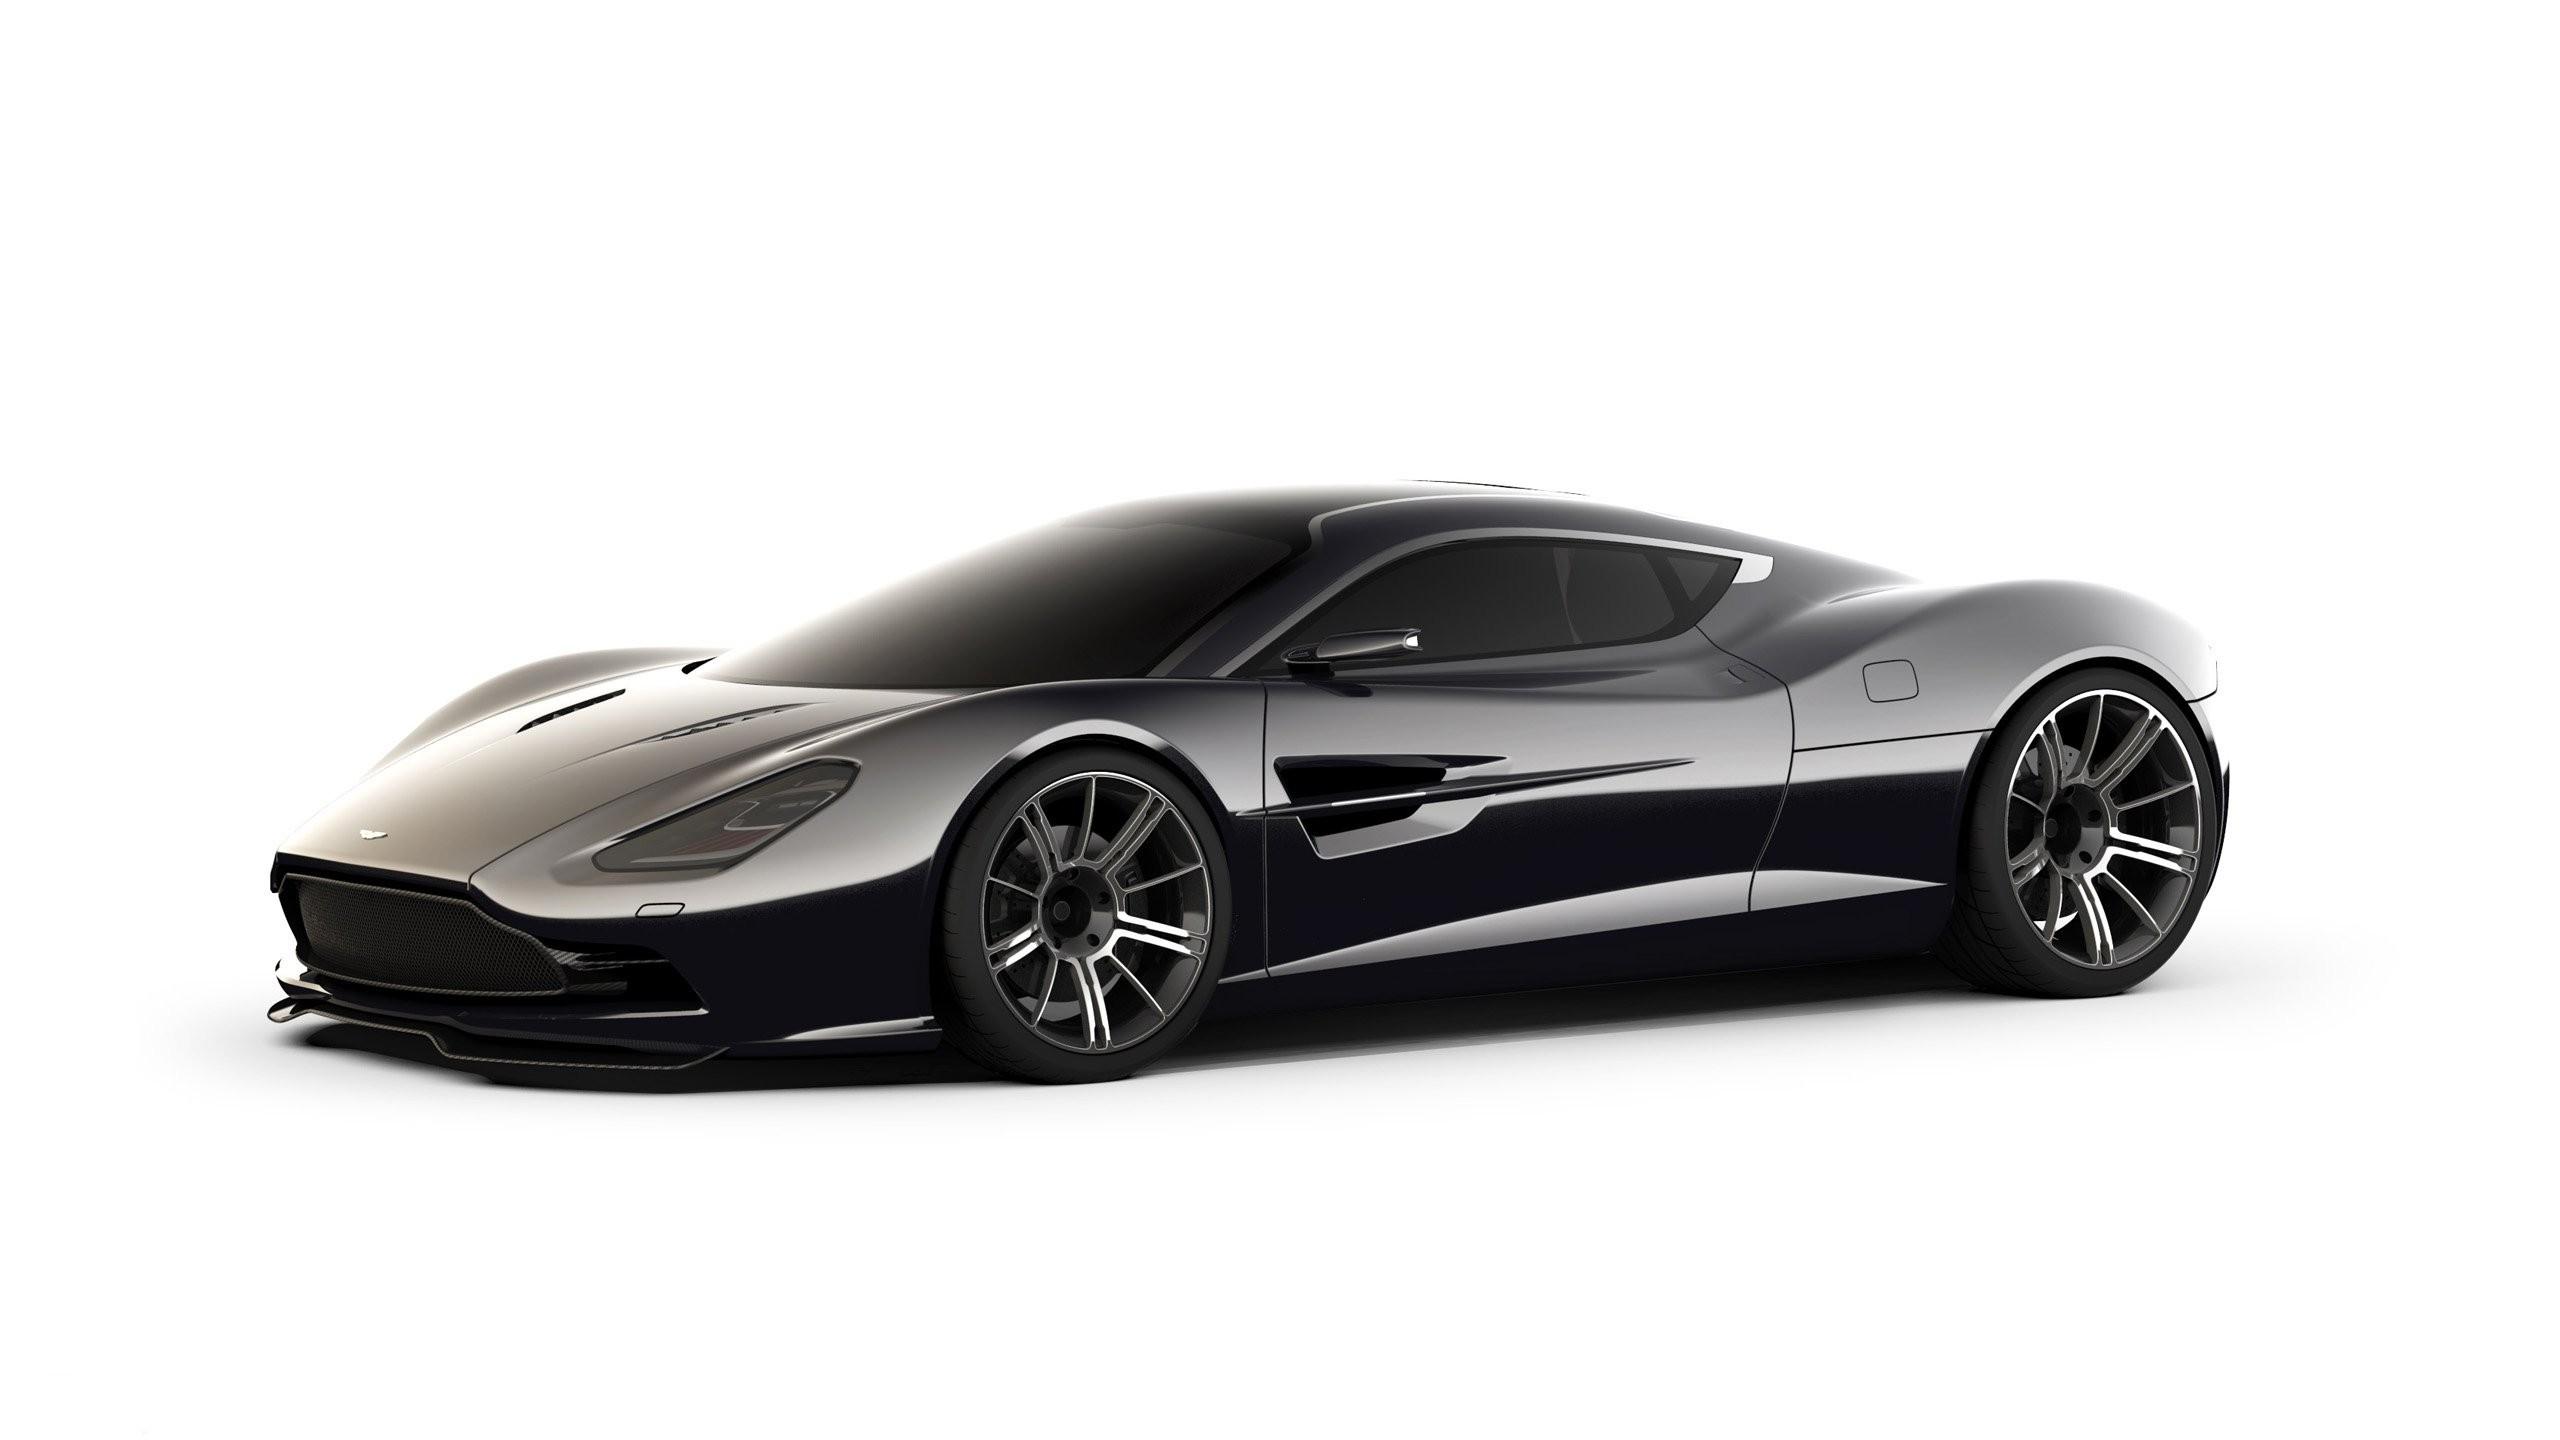 2560x1440 Px Aston Martin DBC Concept Cars